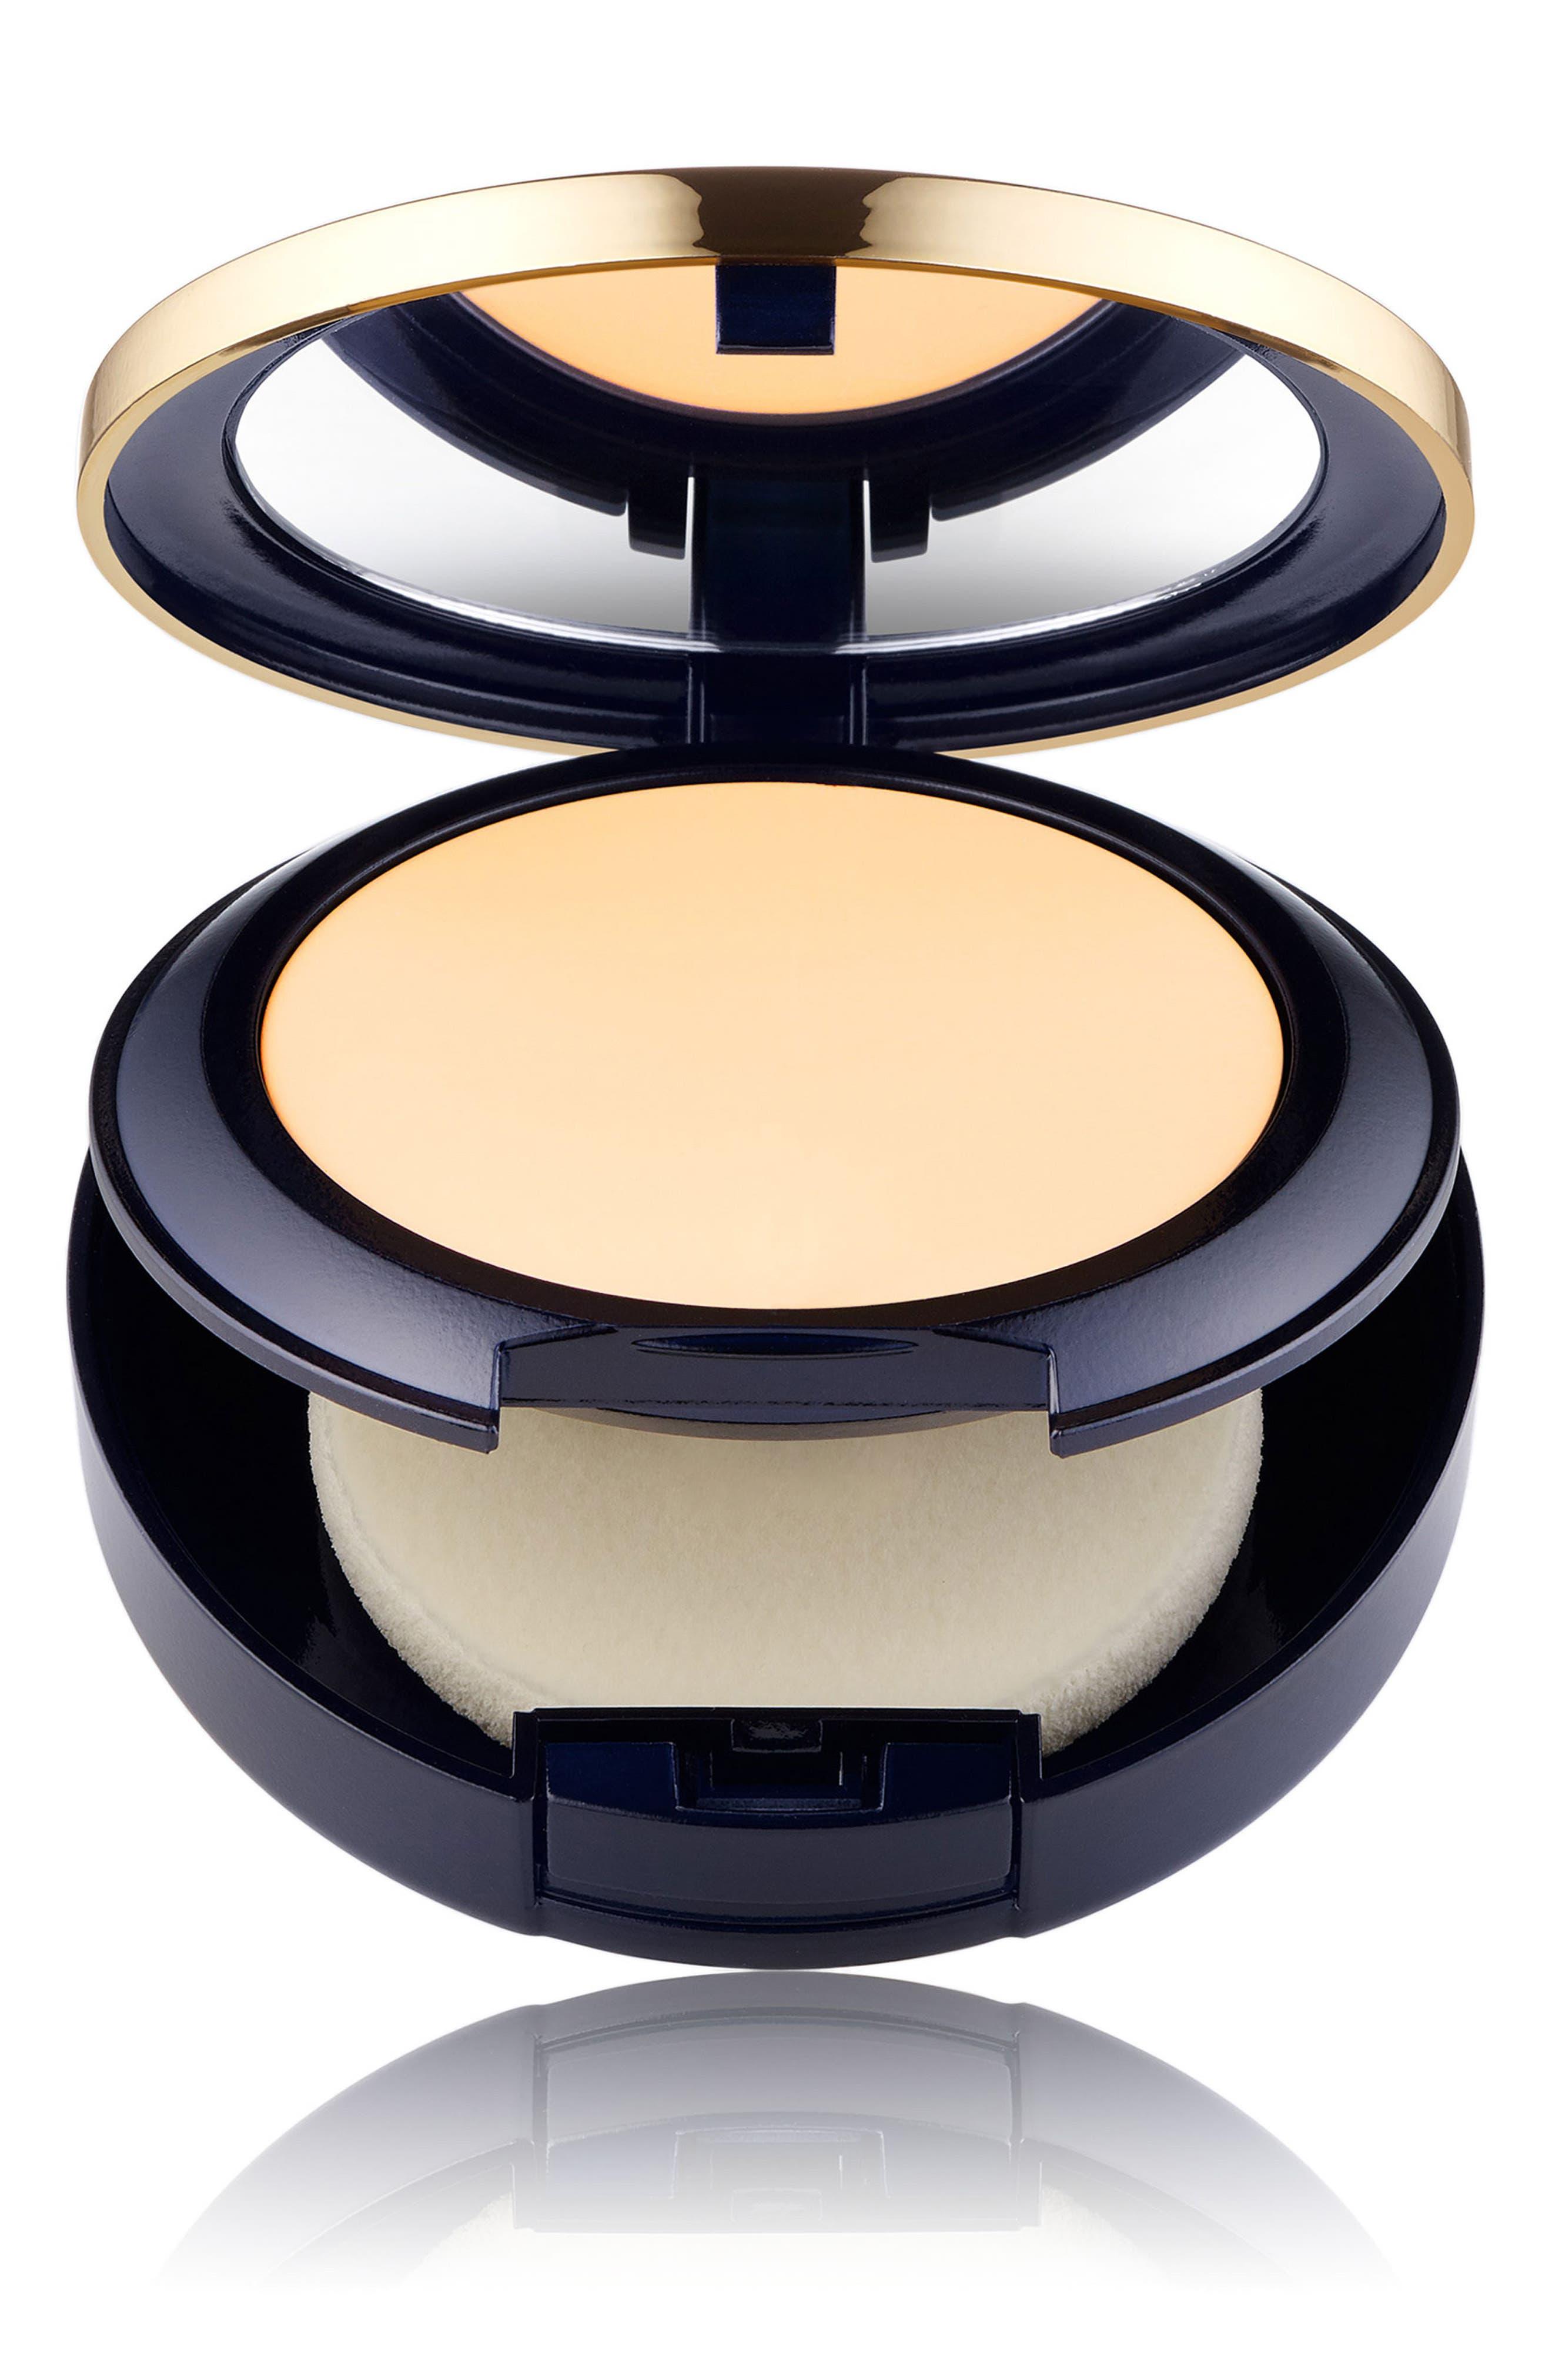 Estee Lauder Double Wear Stay In Place Matte Powder Foundation - 1W0 Warm Porcelain